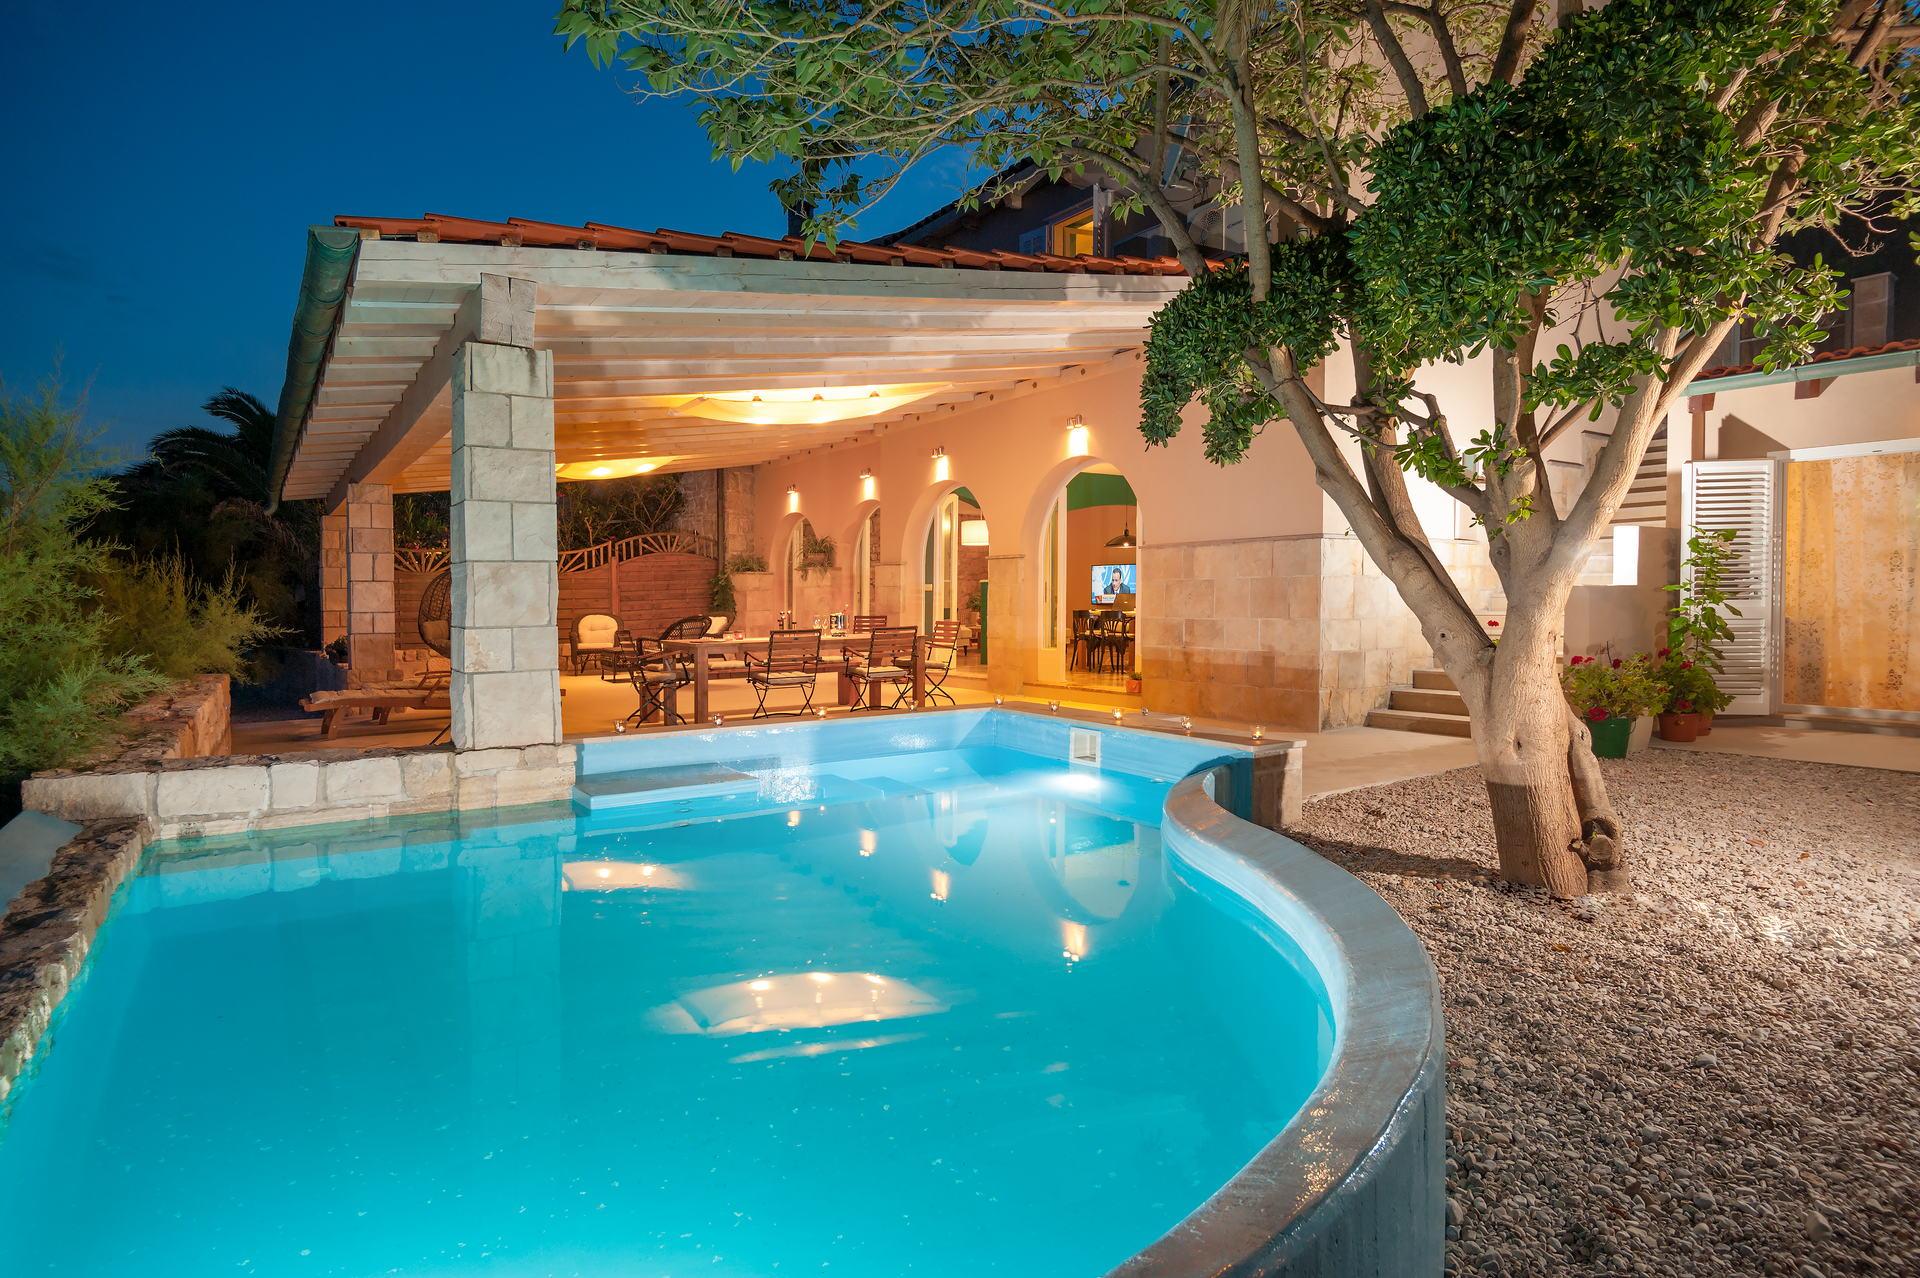 Villa Aurora with Swimming pool